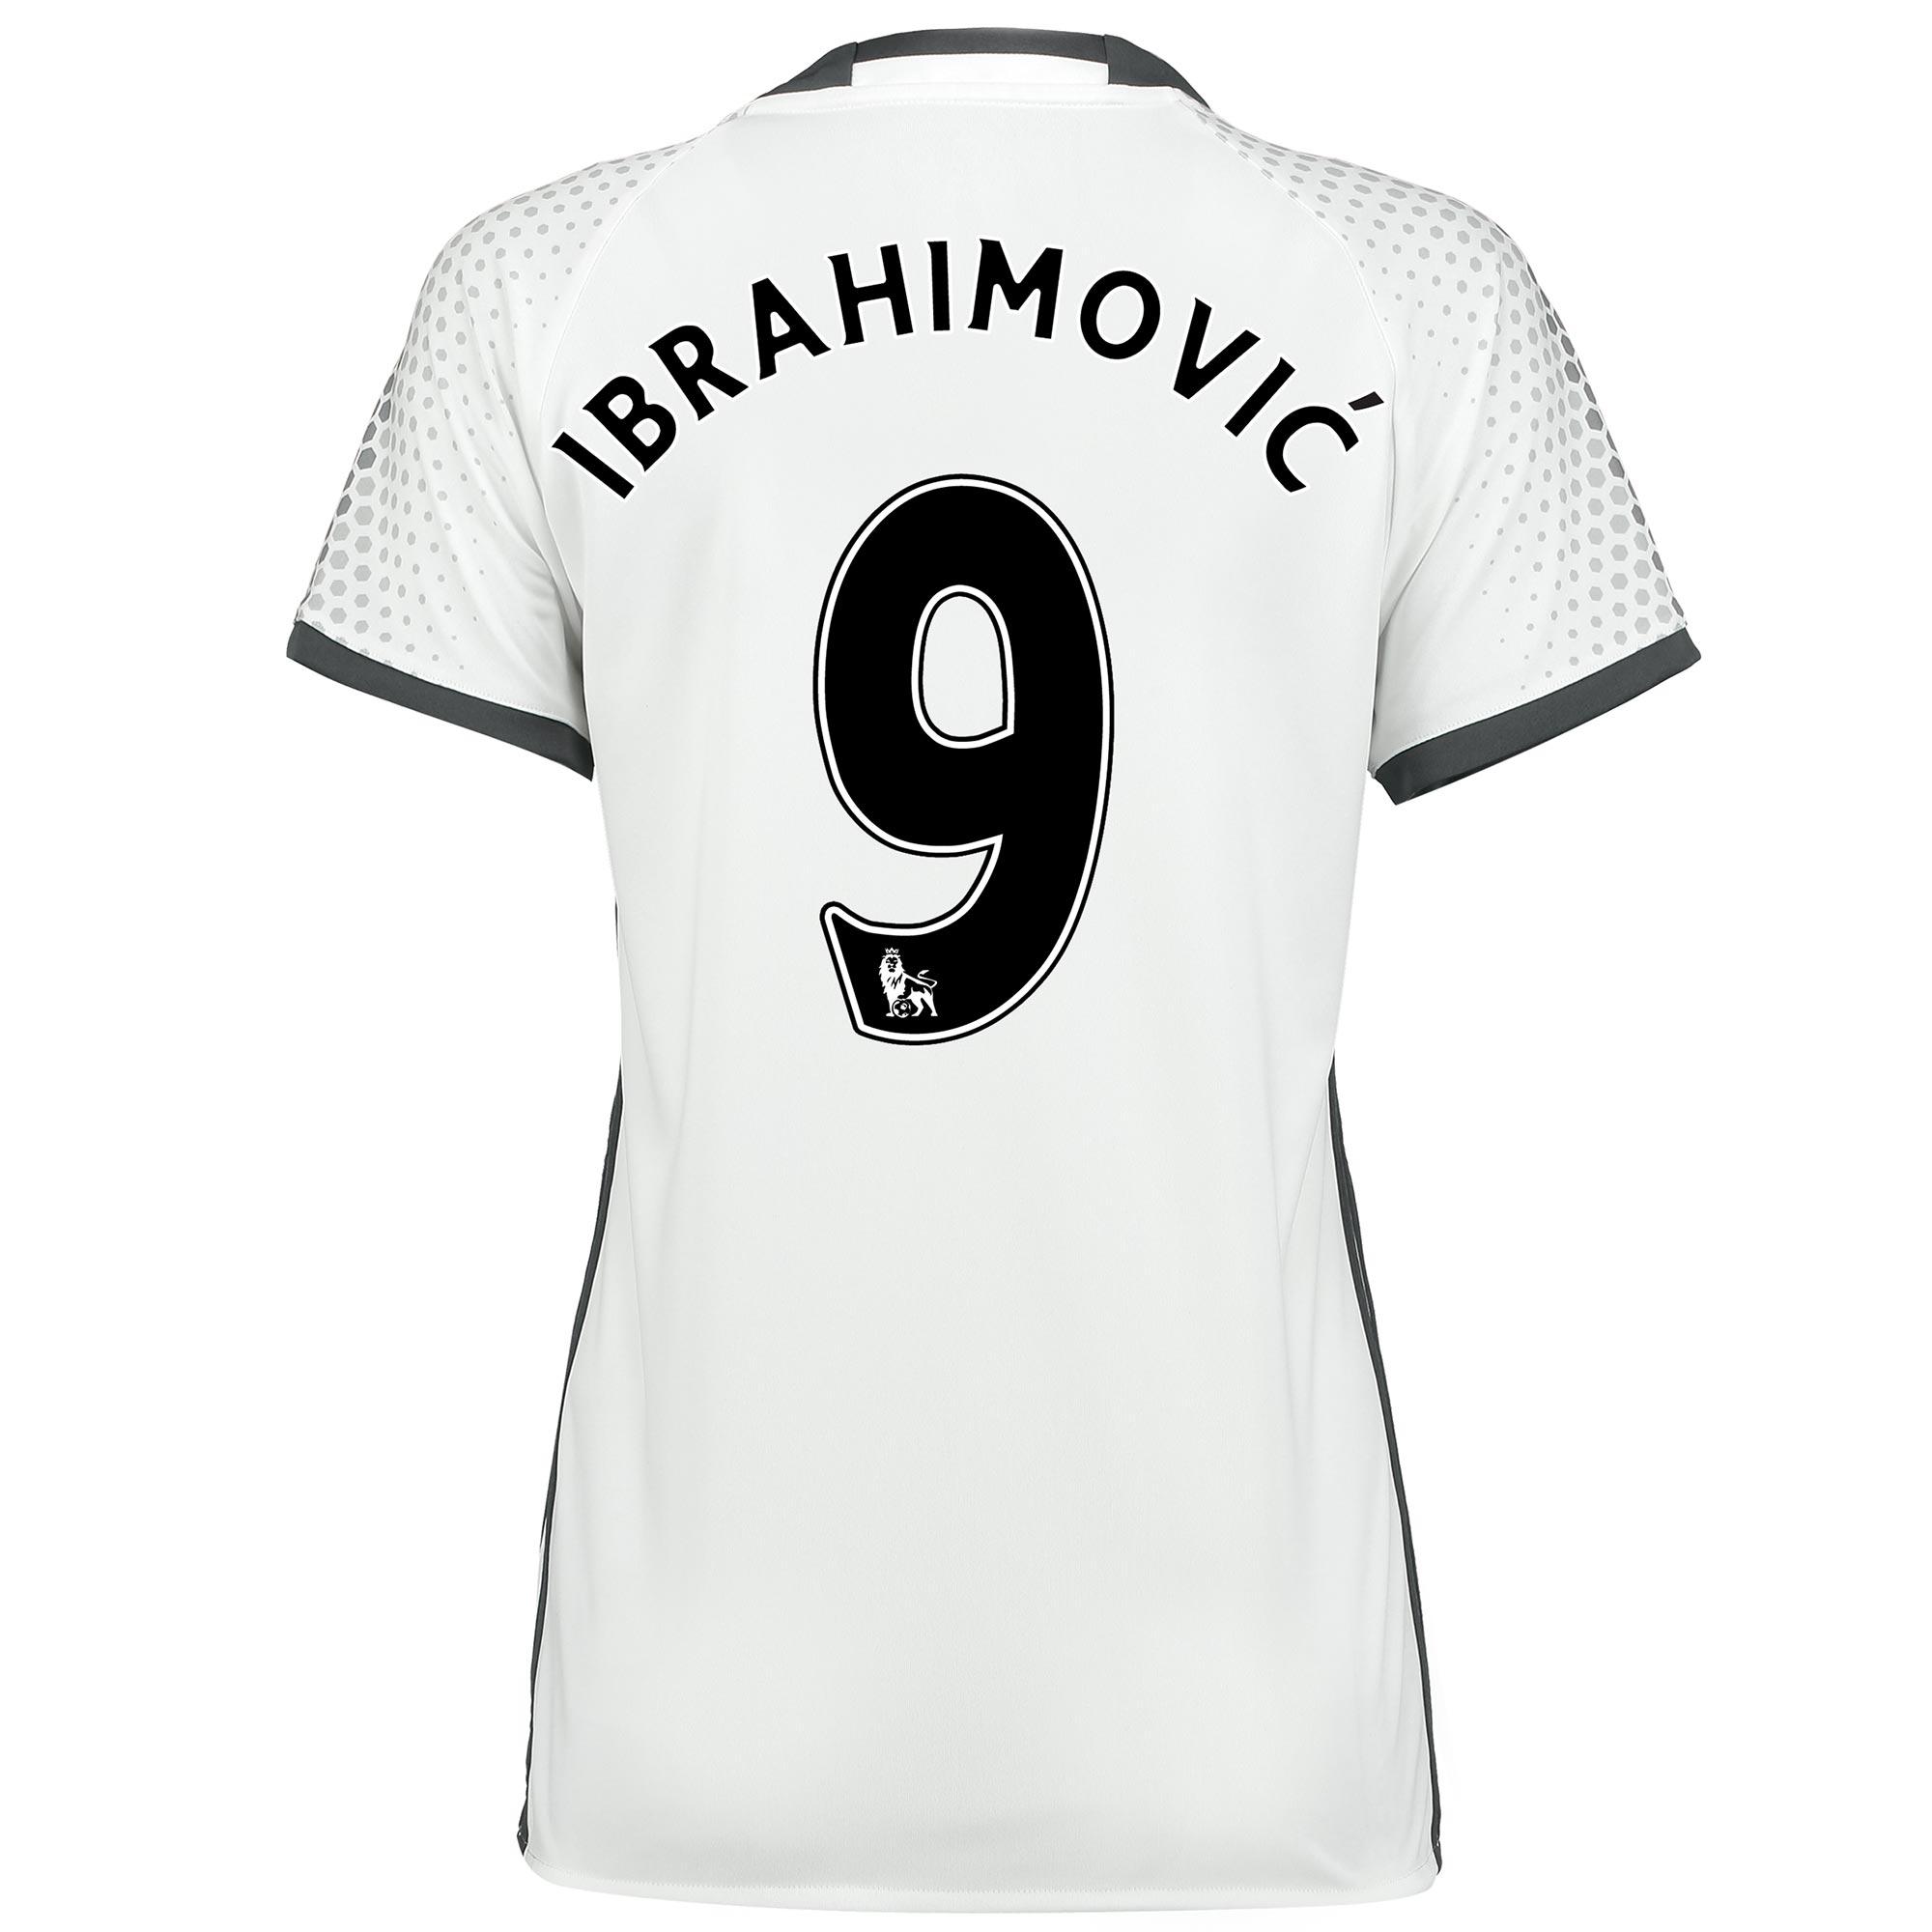 Manchester United Third Shirt 2016-17 - Womens with Ibrahimovic 9 prin